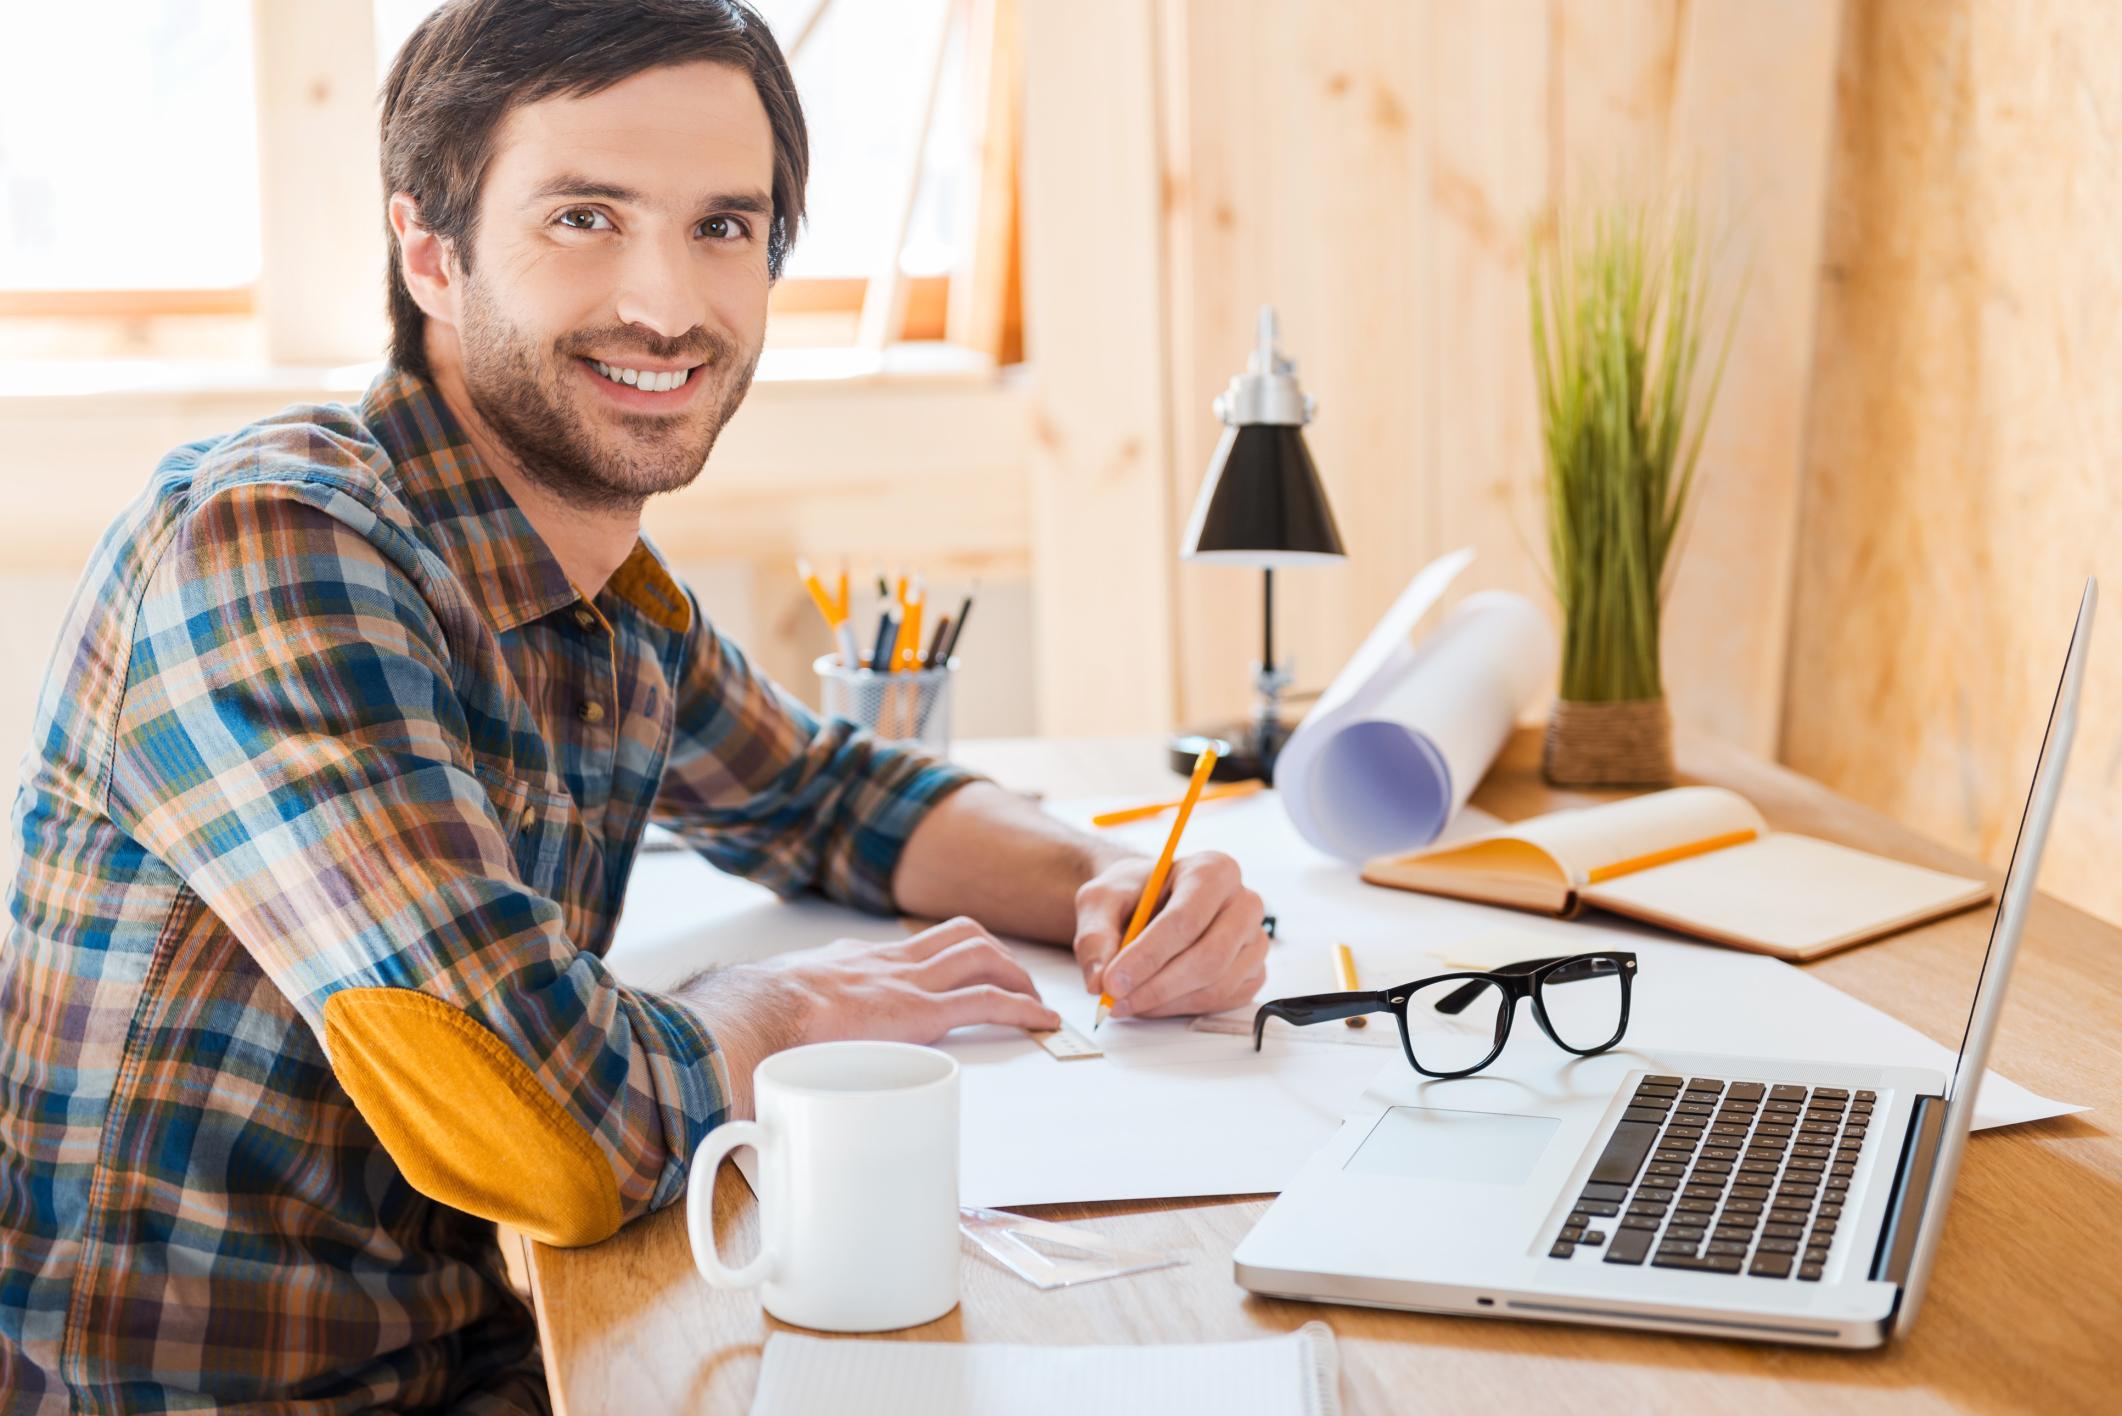 5 Tips for Effective Online Reputation Management